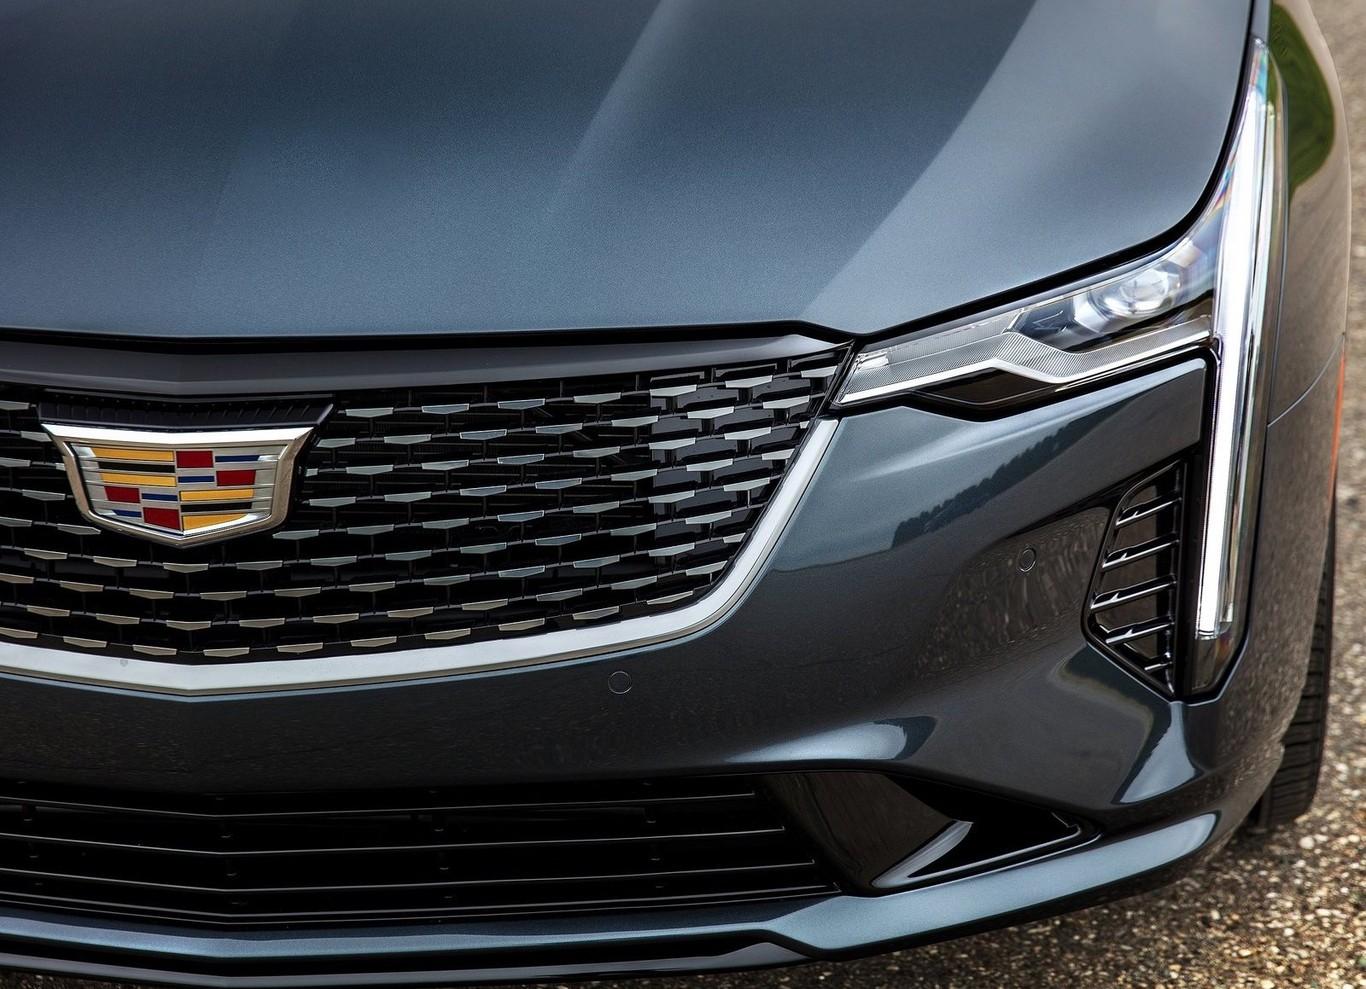 2021 Cadillac Deville Picture